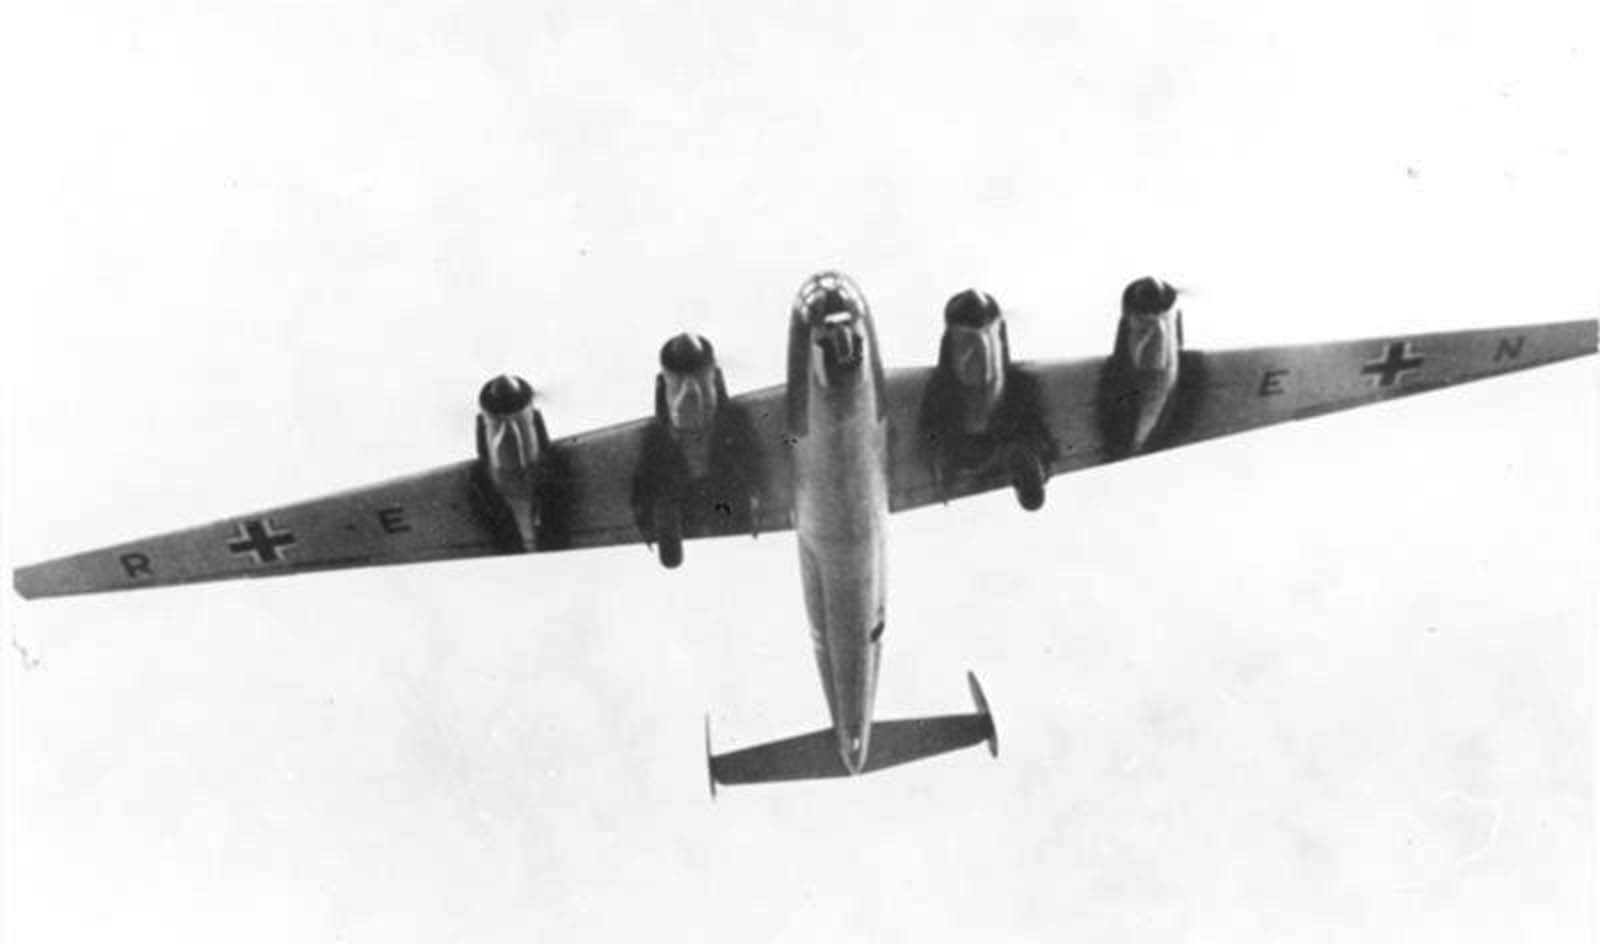 Me 264 V1 undergoing flight-testing.